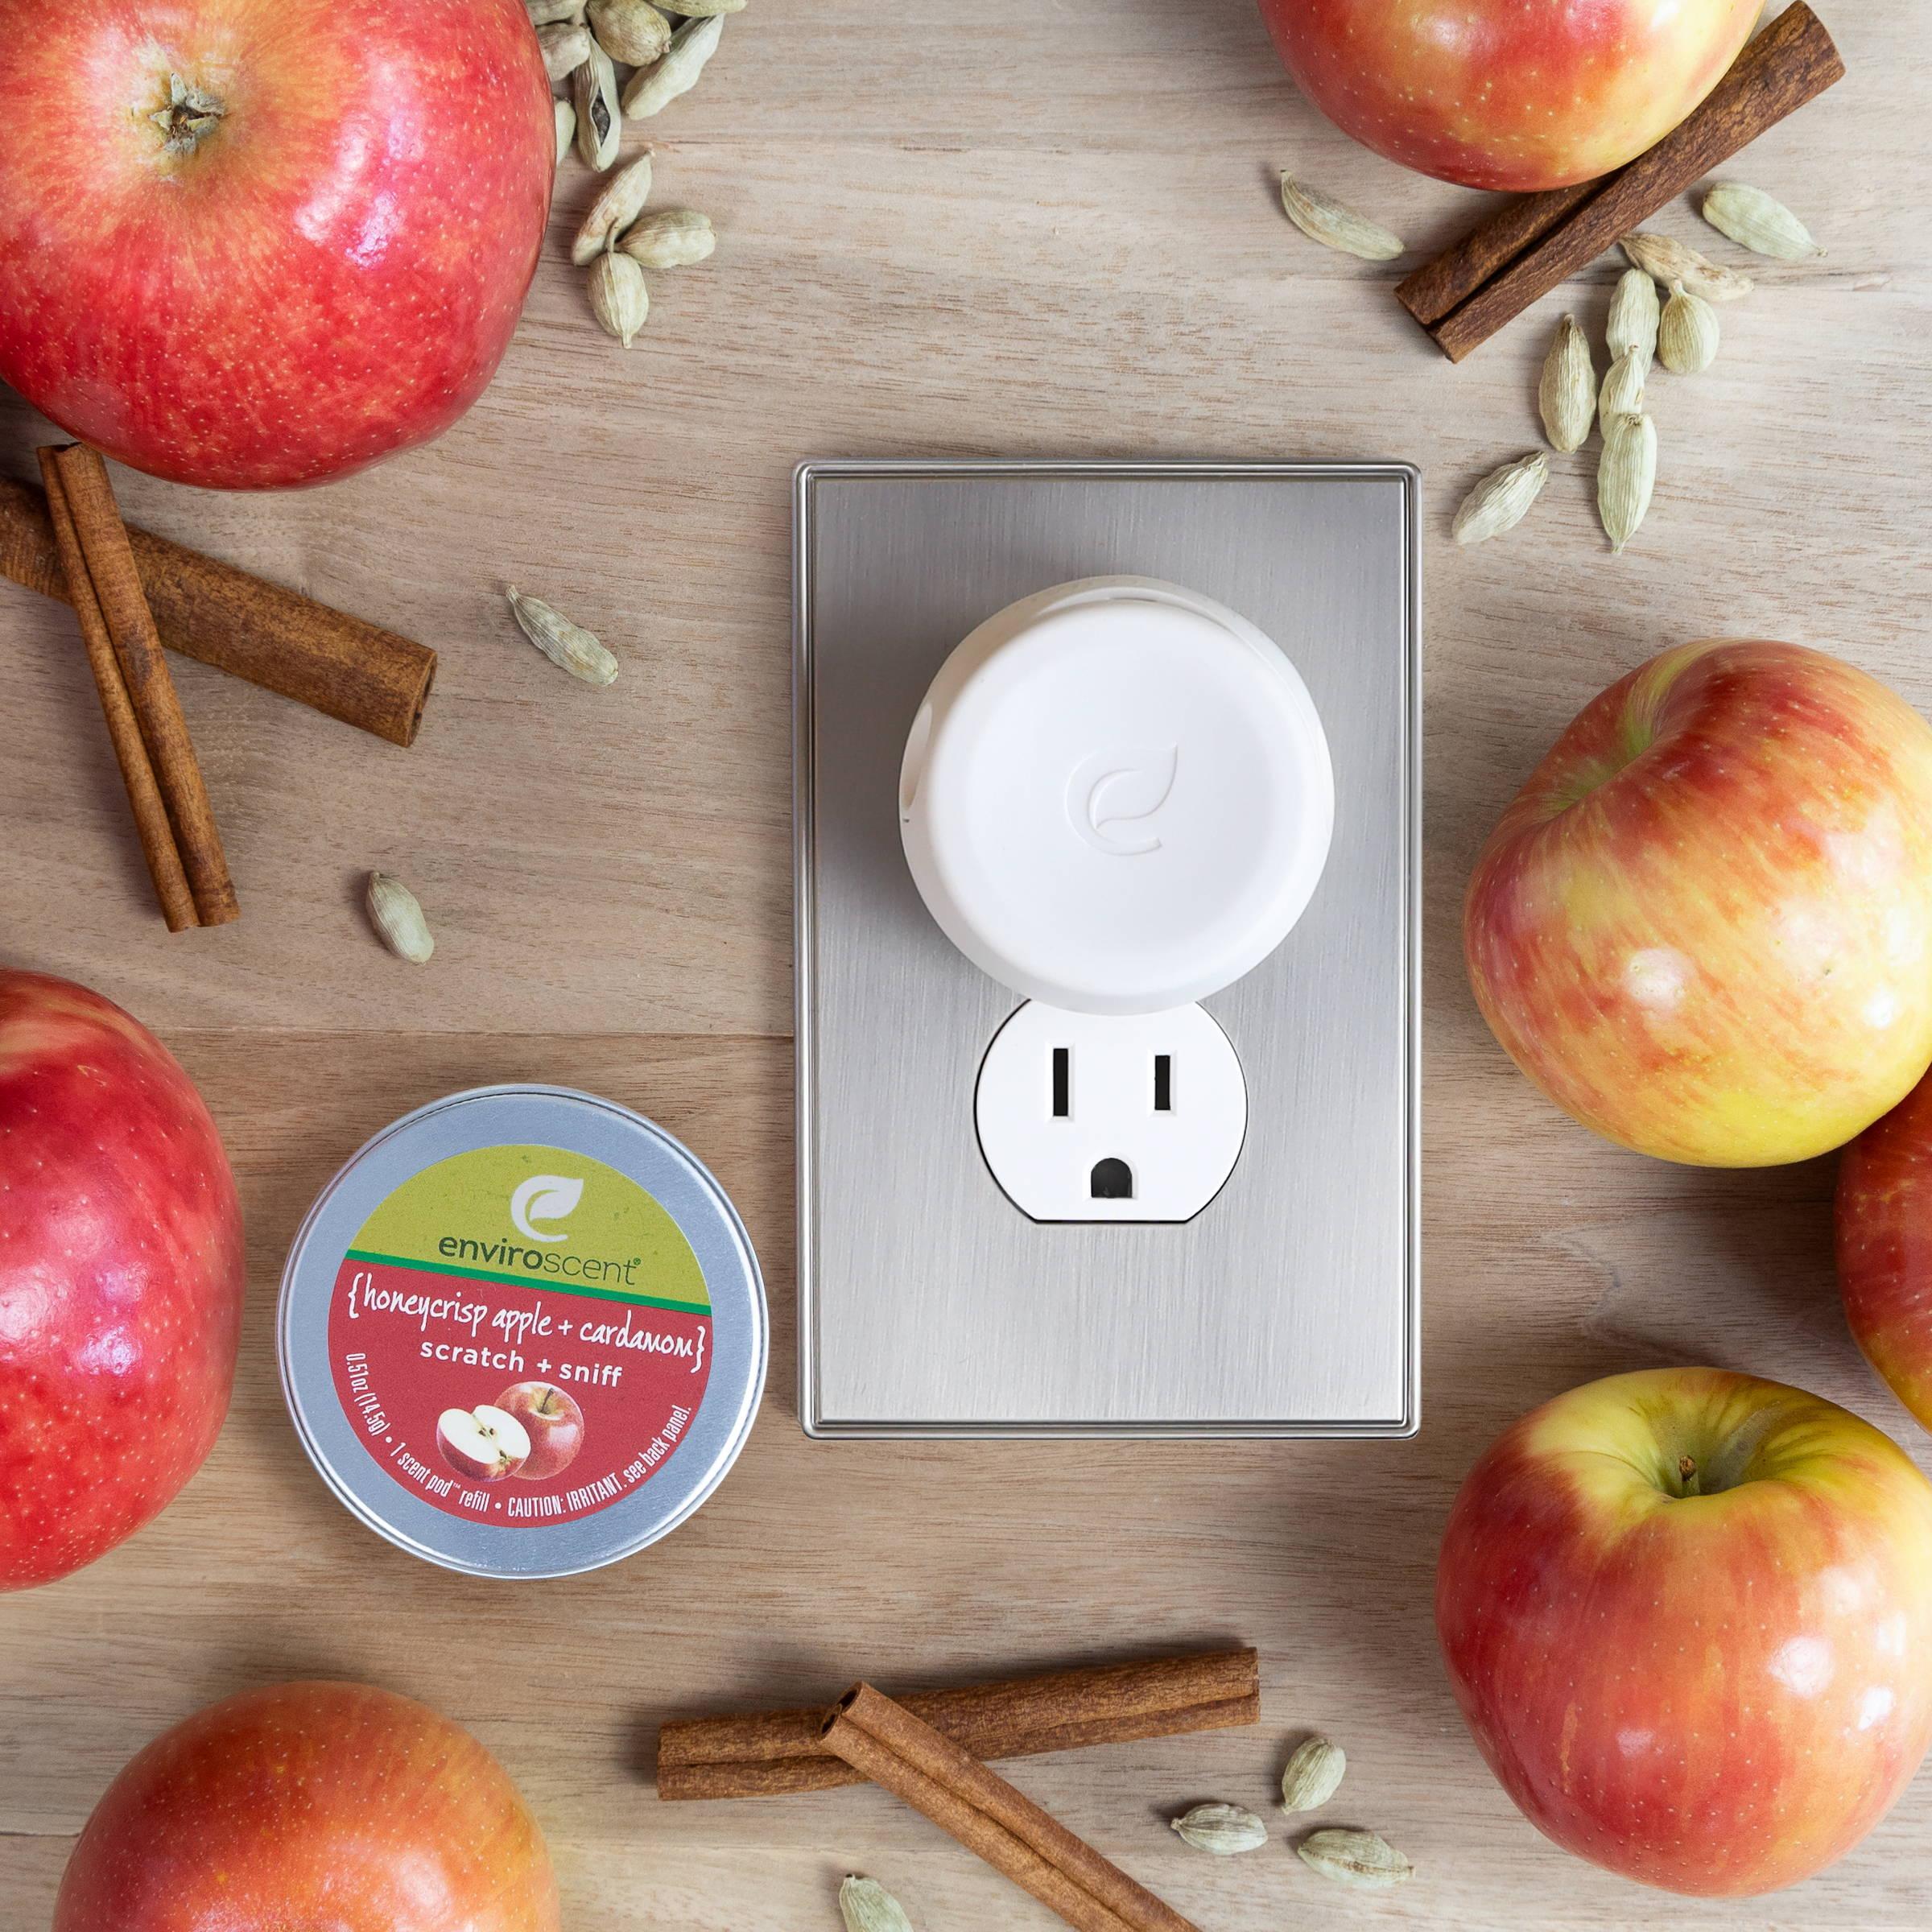 Plug Hub Starter Kit in  Honeycrisp Apple + Cardamom